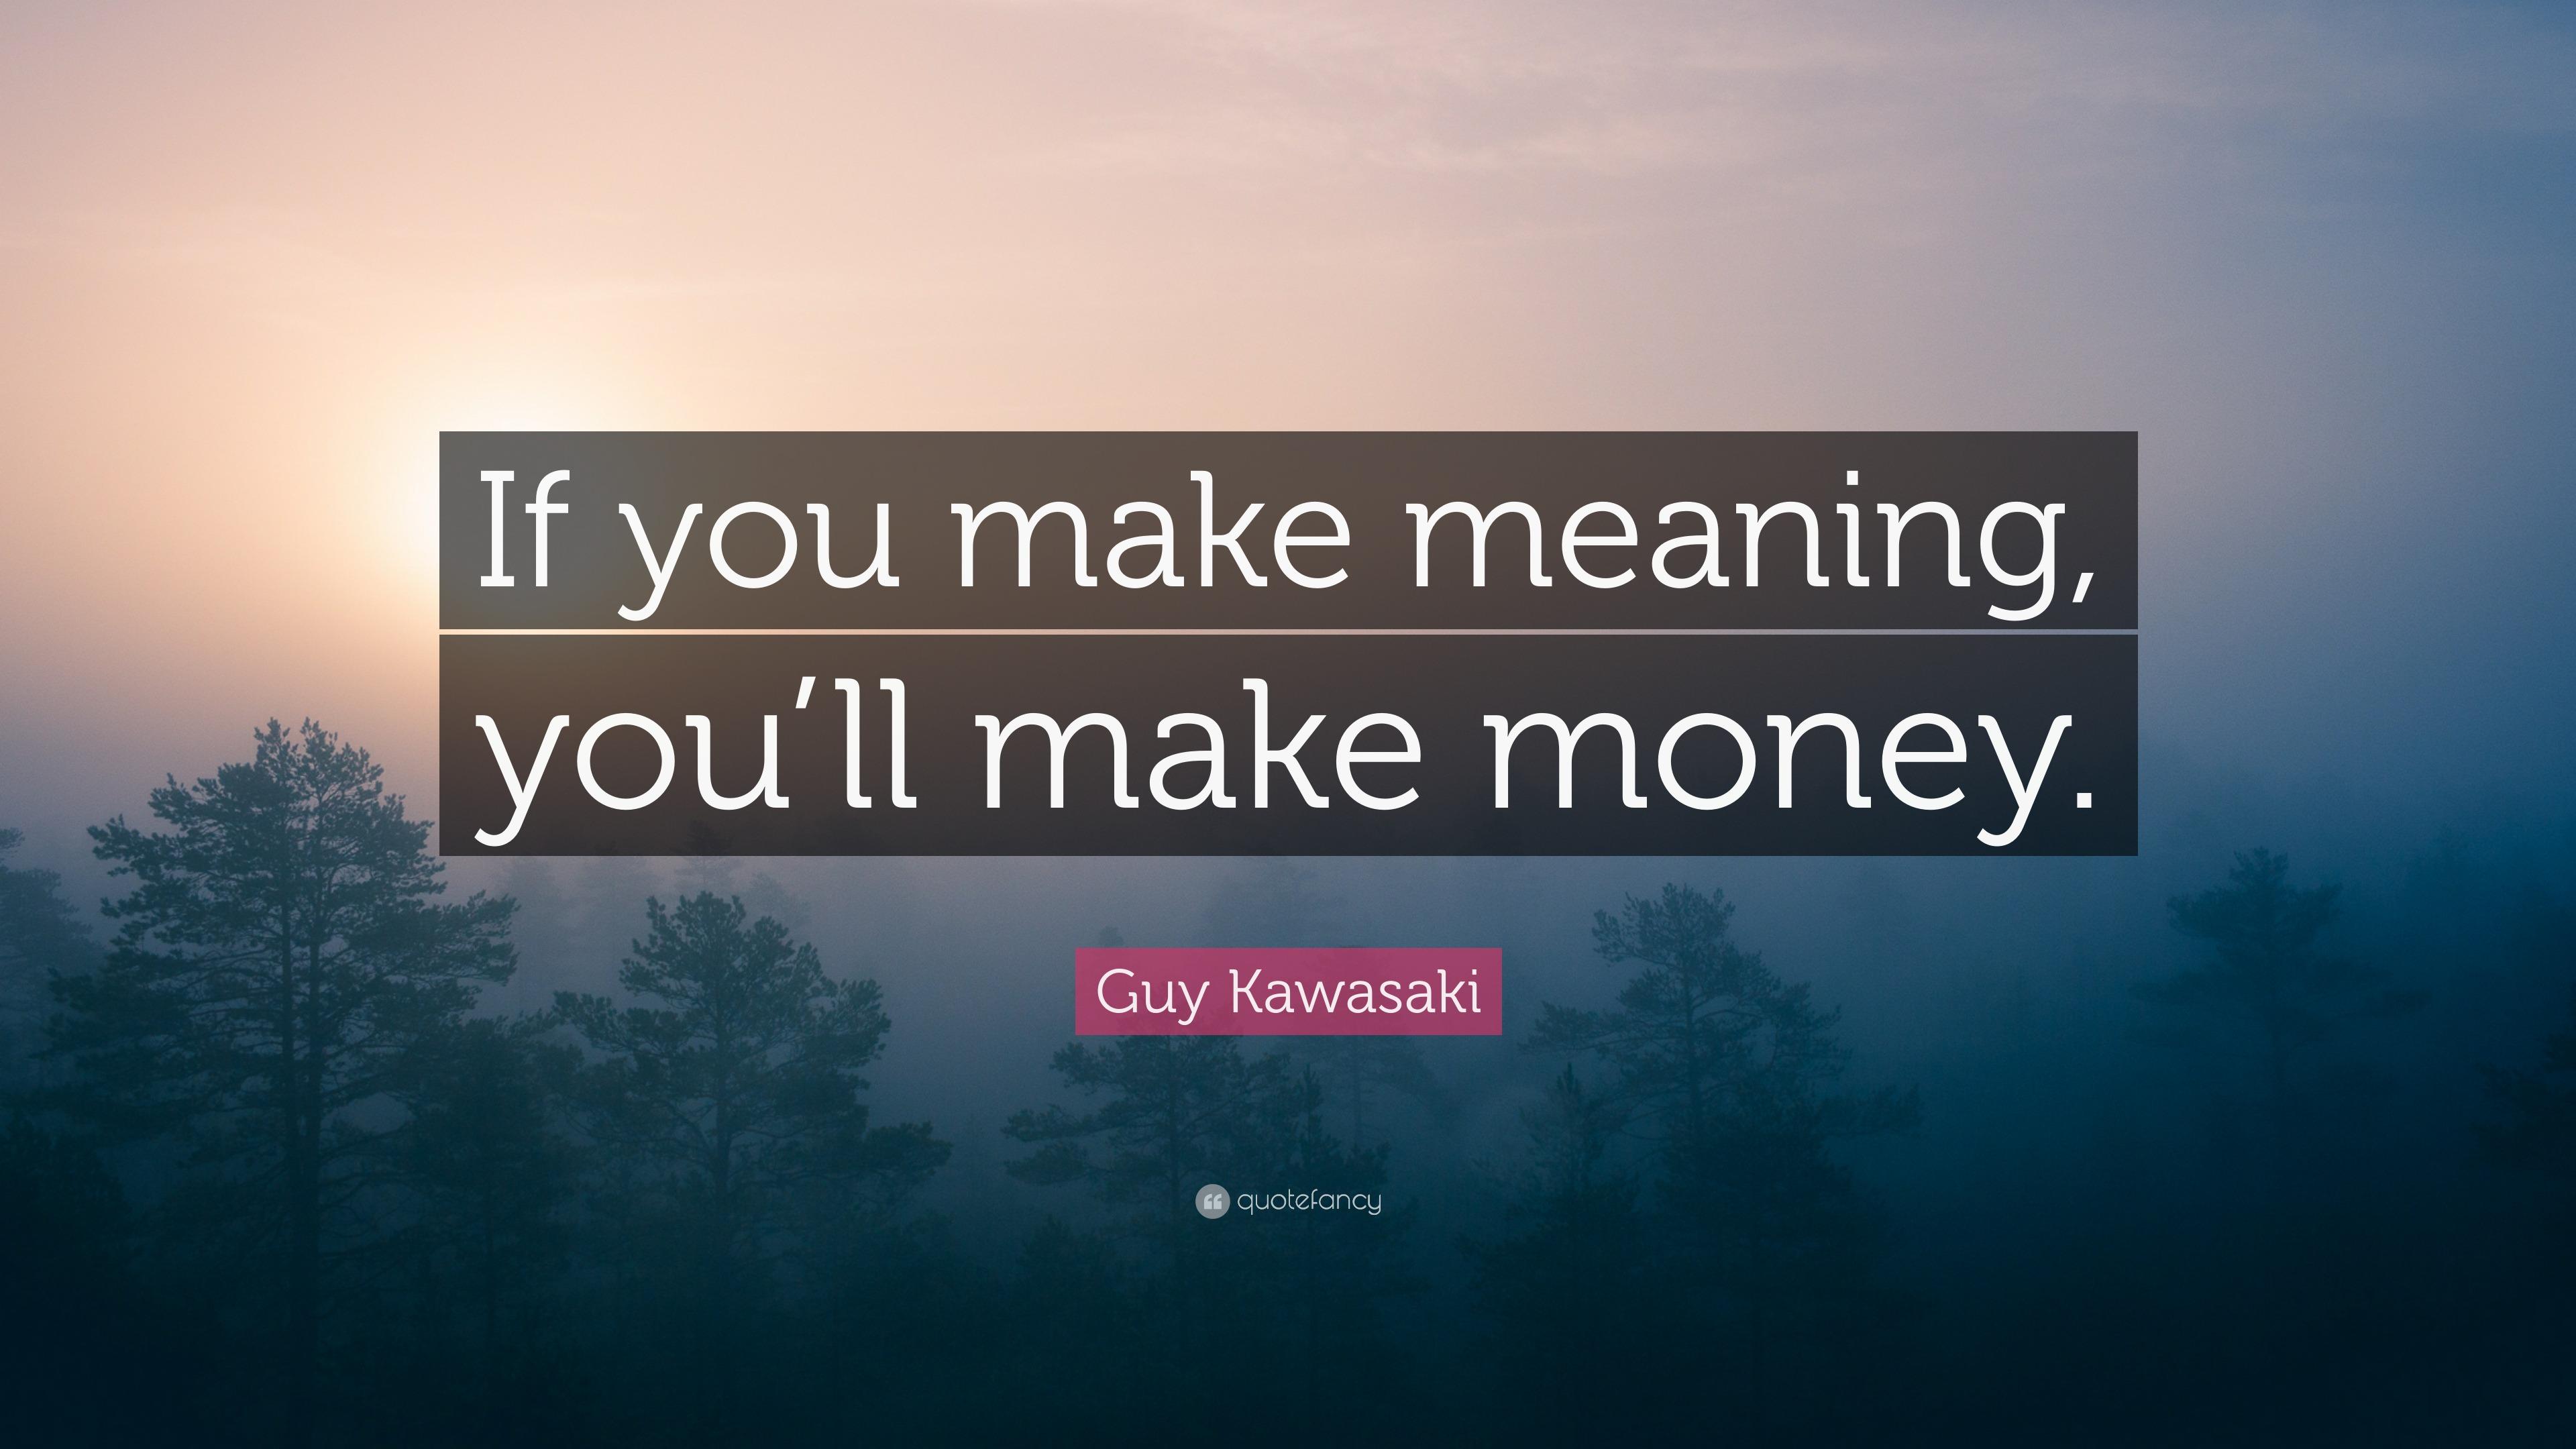 "Guy Kawasaki Quote ""If you make meaning, you'll make money."""